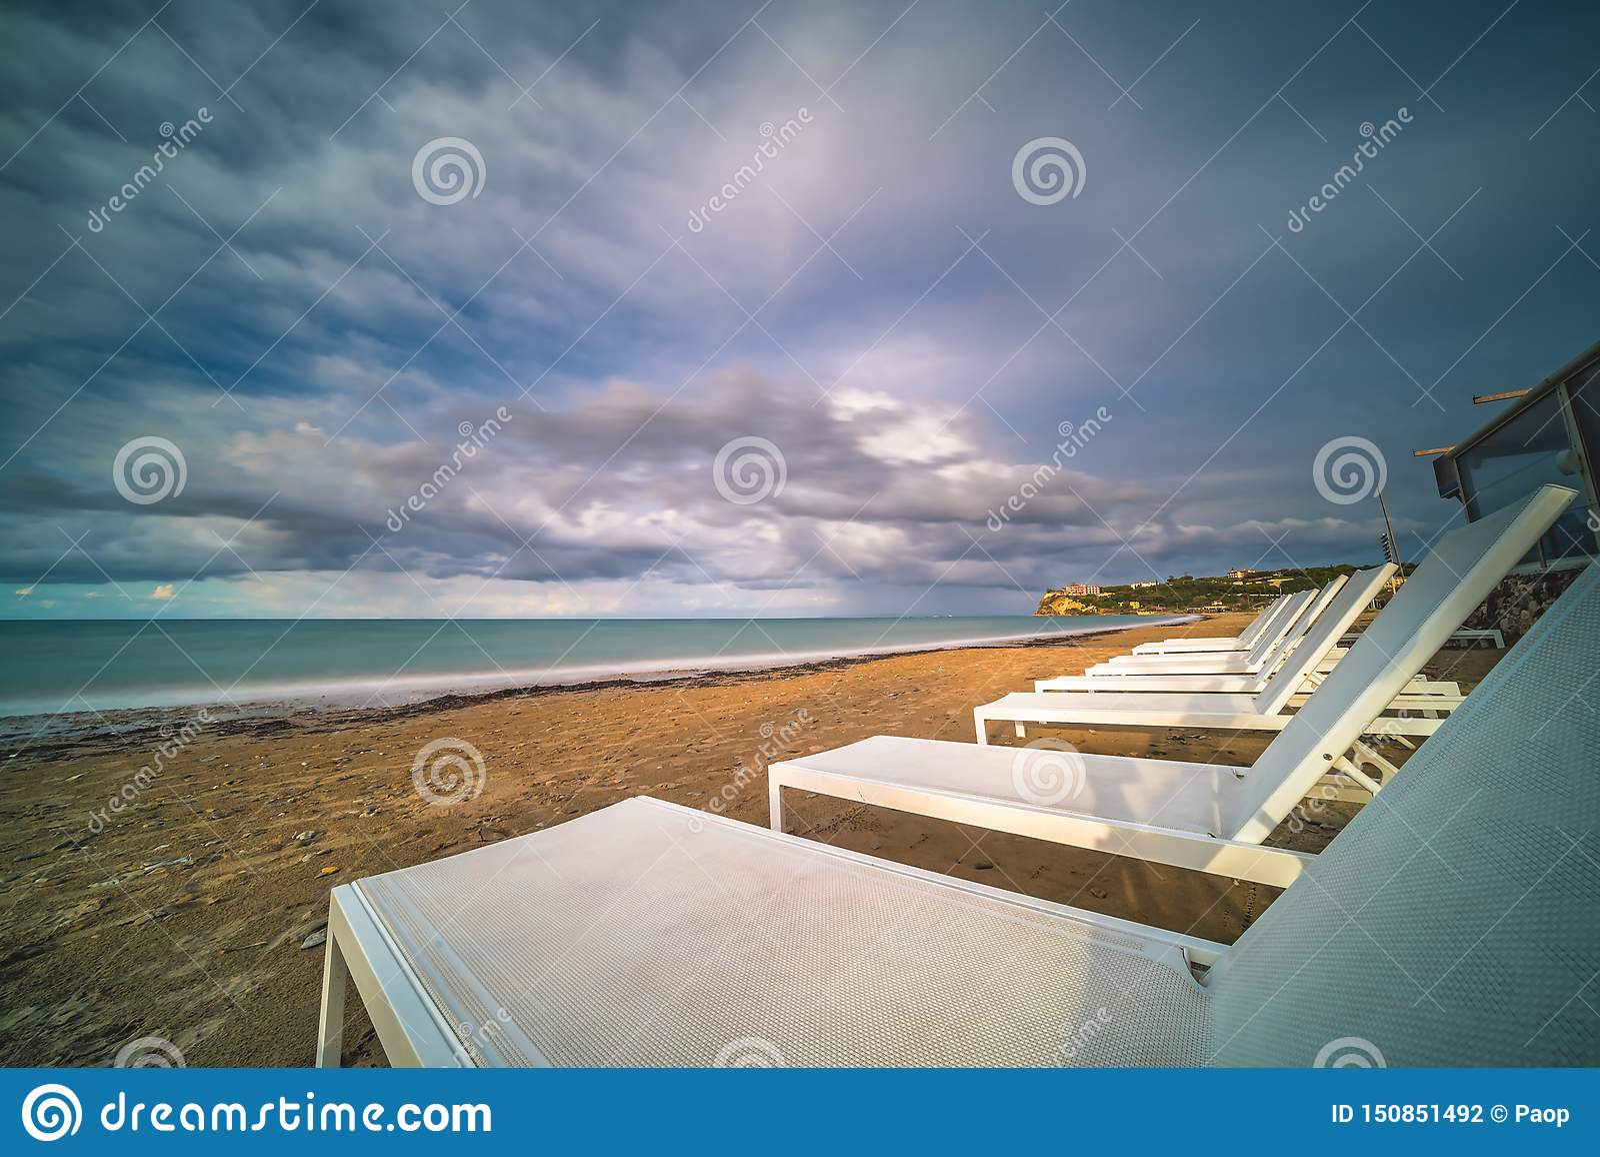 Plastic sunbeds on Tsilivi beach in Zante Island